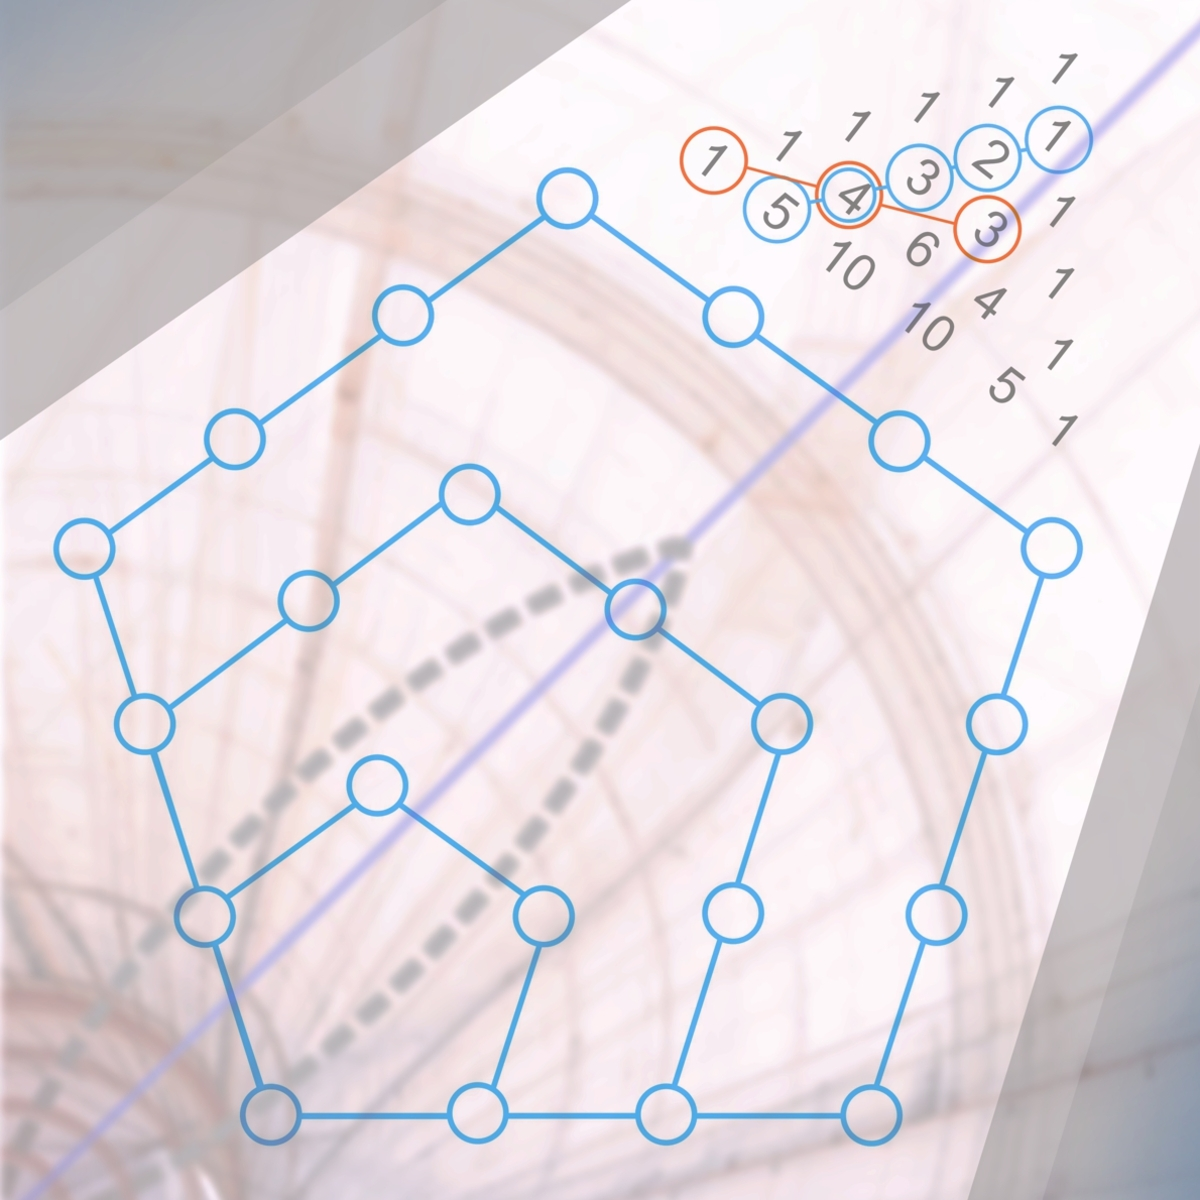 Introduction to Enumerative Combinatorics course image